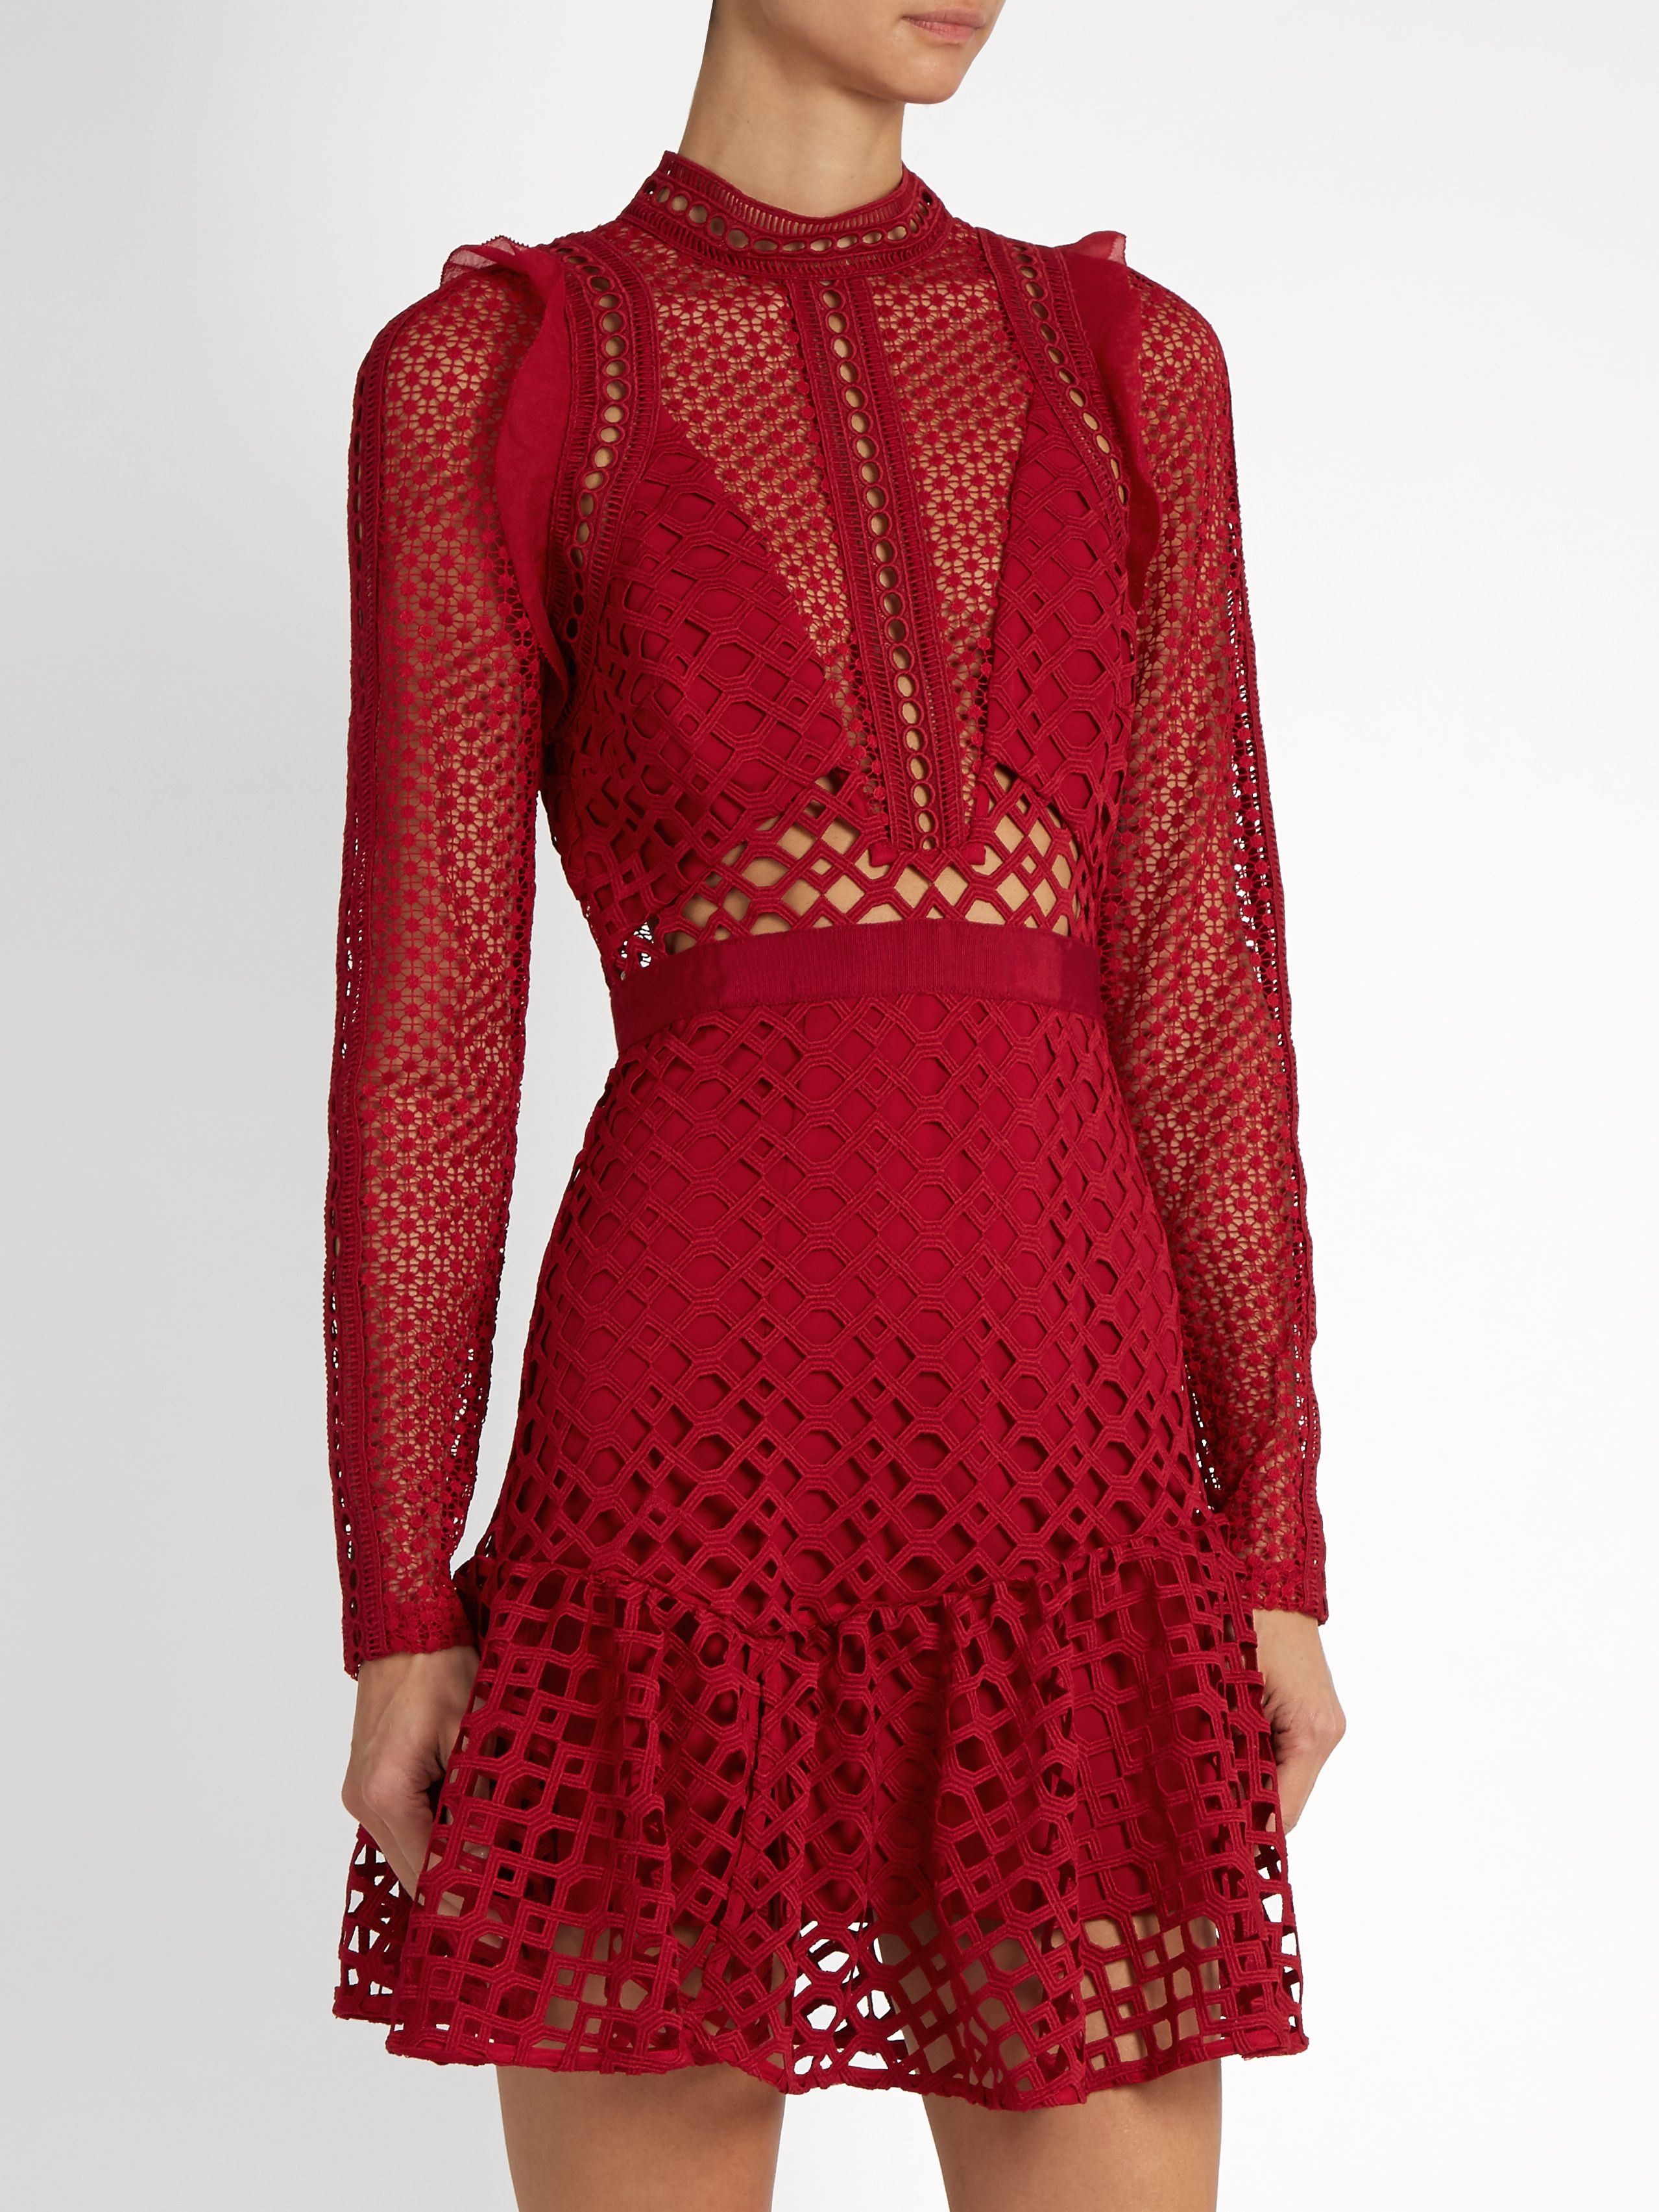 2d5de68f2031 Click here to buy Self-portrait Hall lace mini dress at MATCHESFASHION.COM